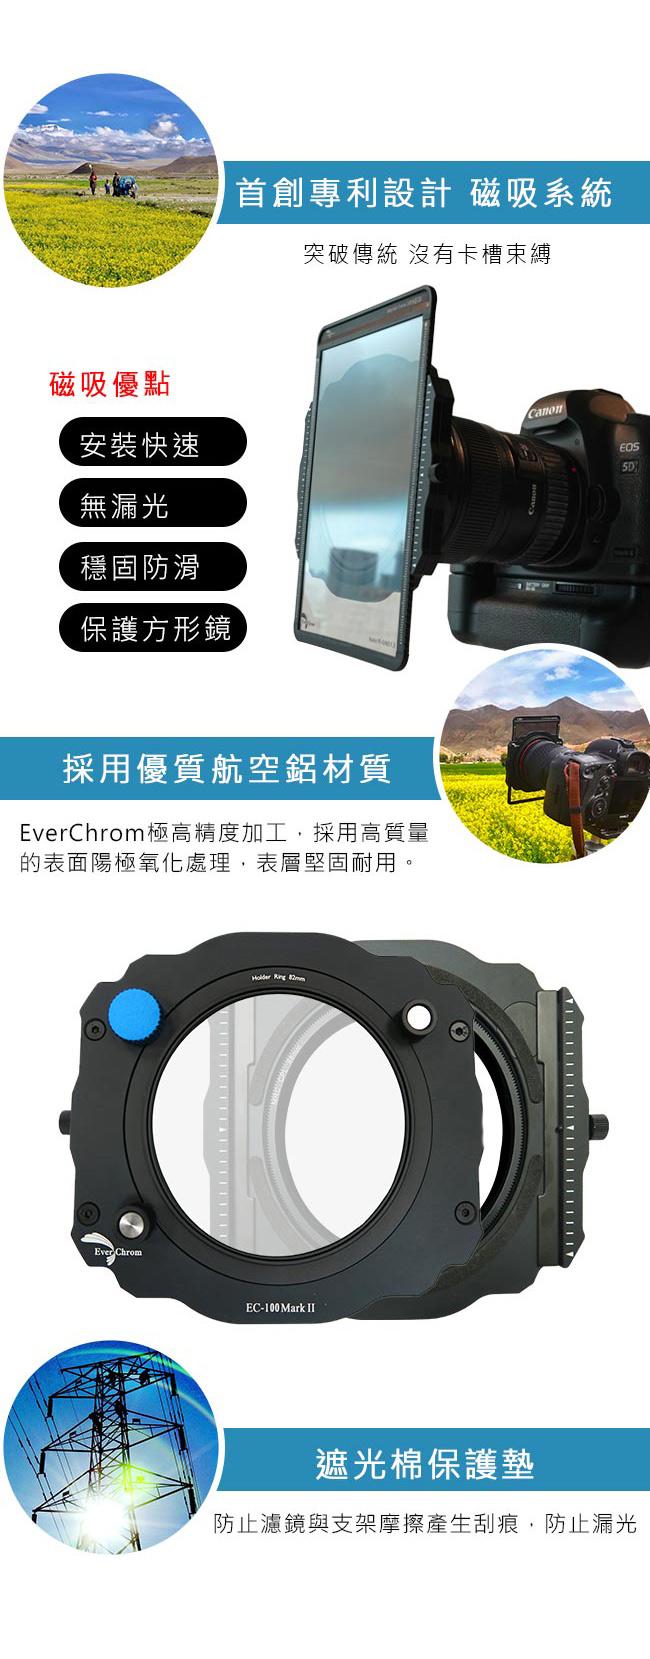 EverChrom,EC100-Mark II